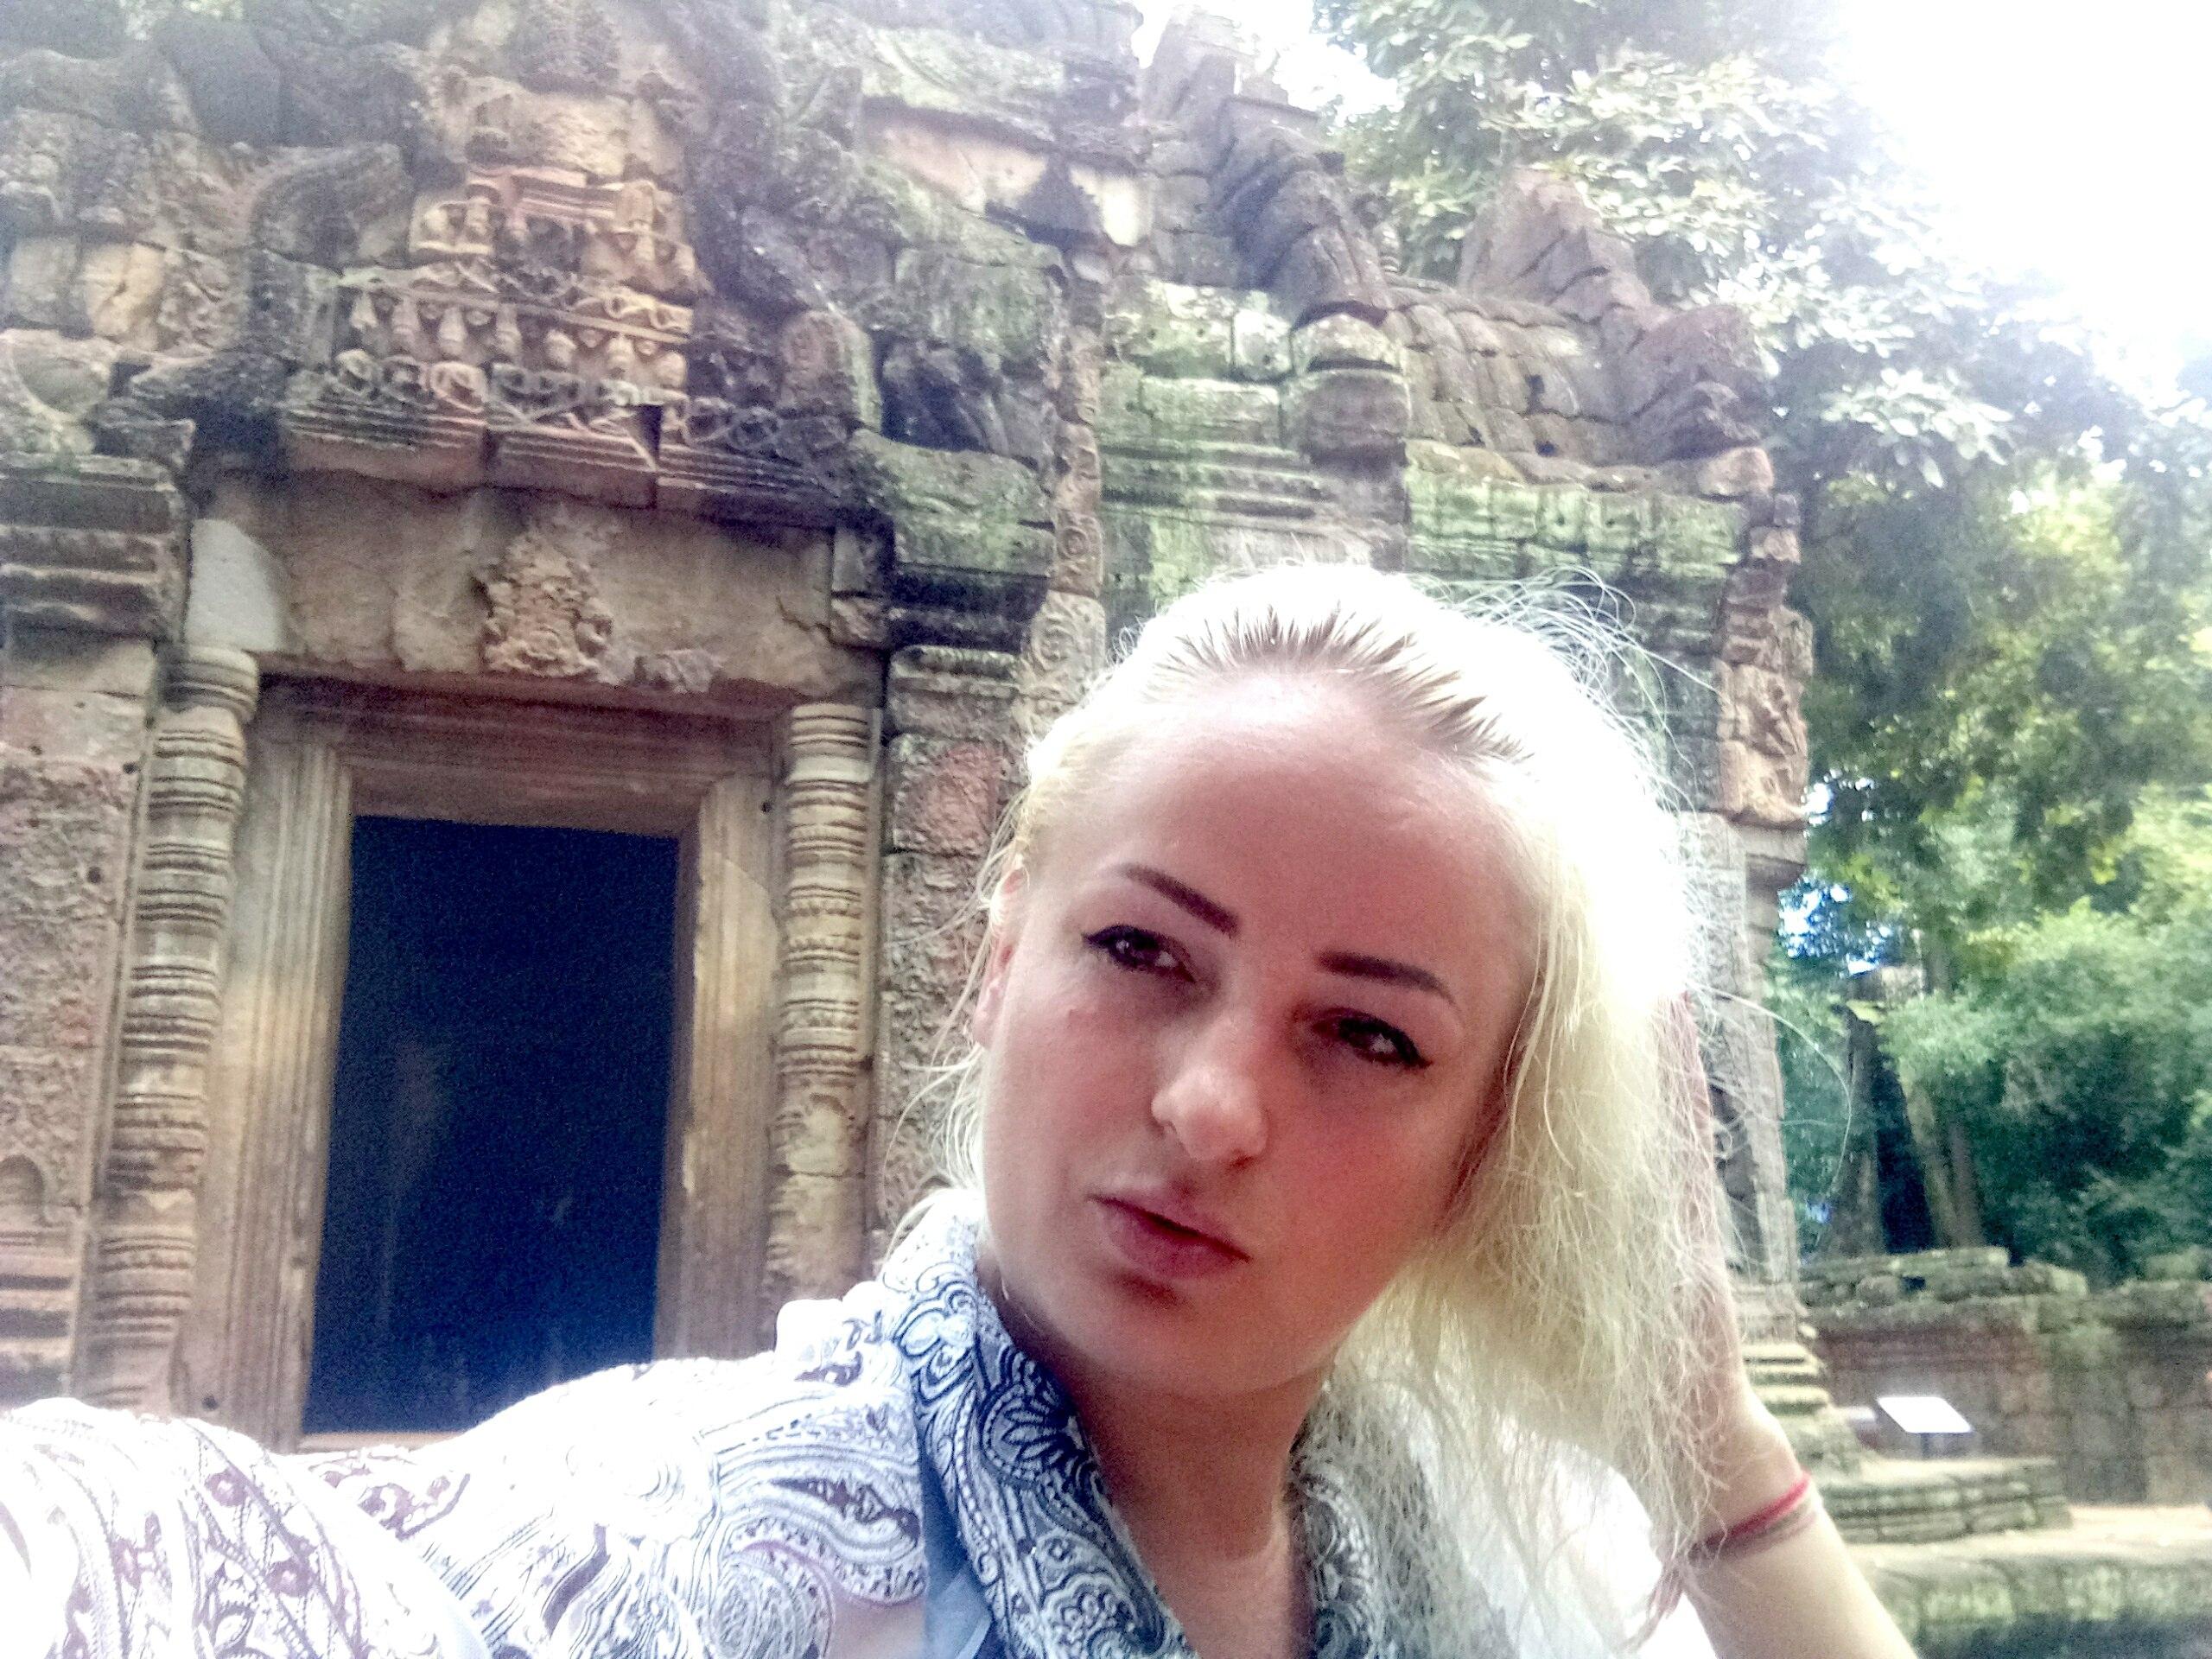 Елена Руденко (Валтея). Камбоджа. Ангкор. - Страница 3 LWM1ygPl-MU